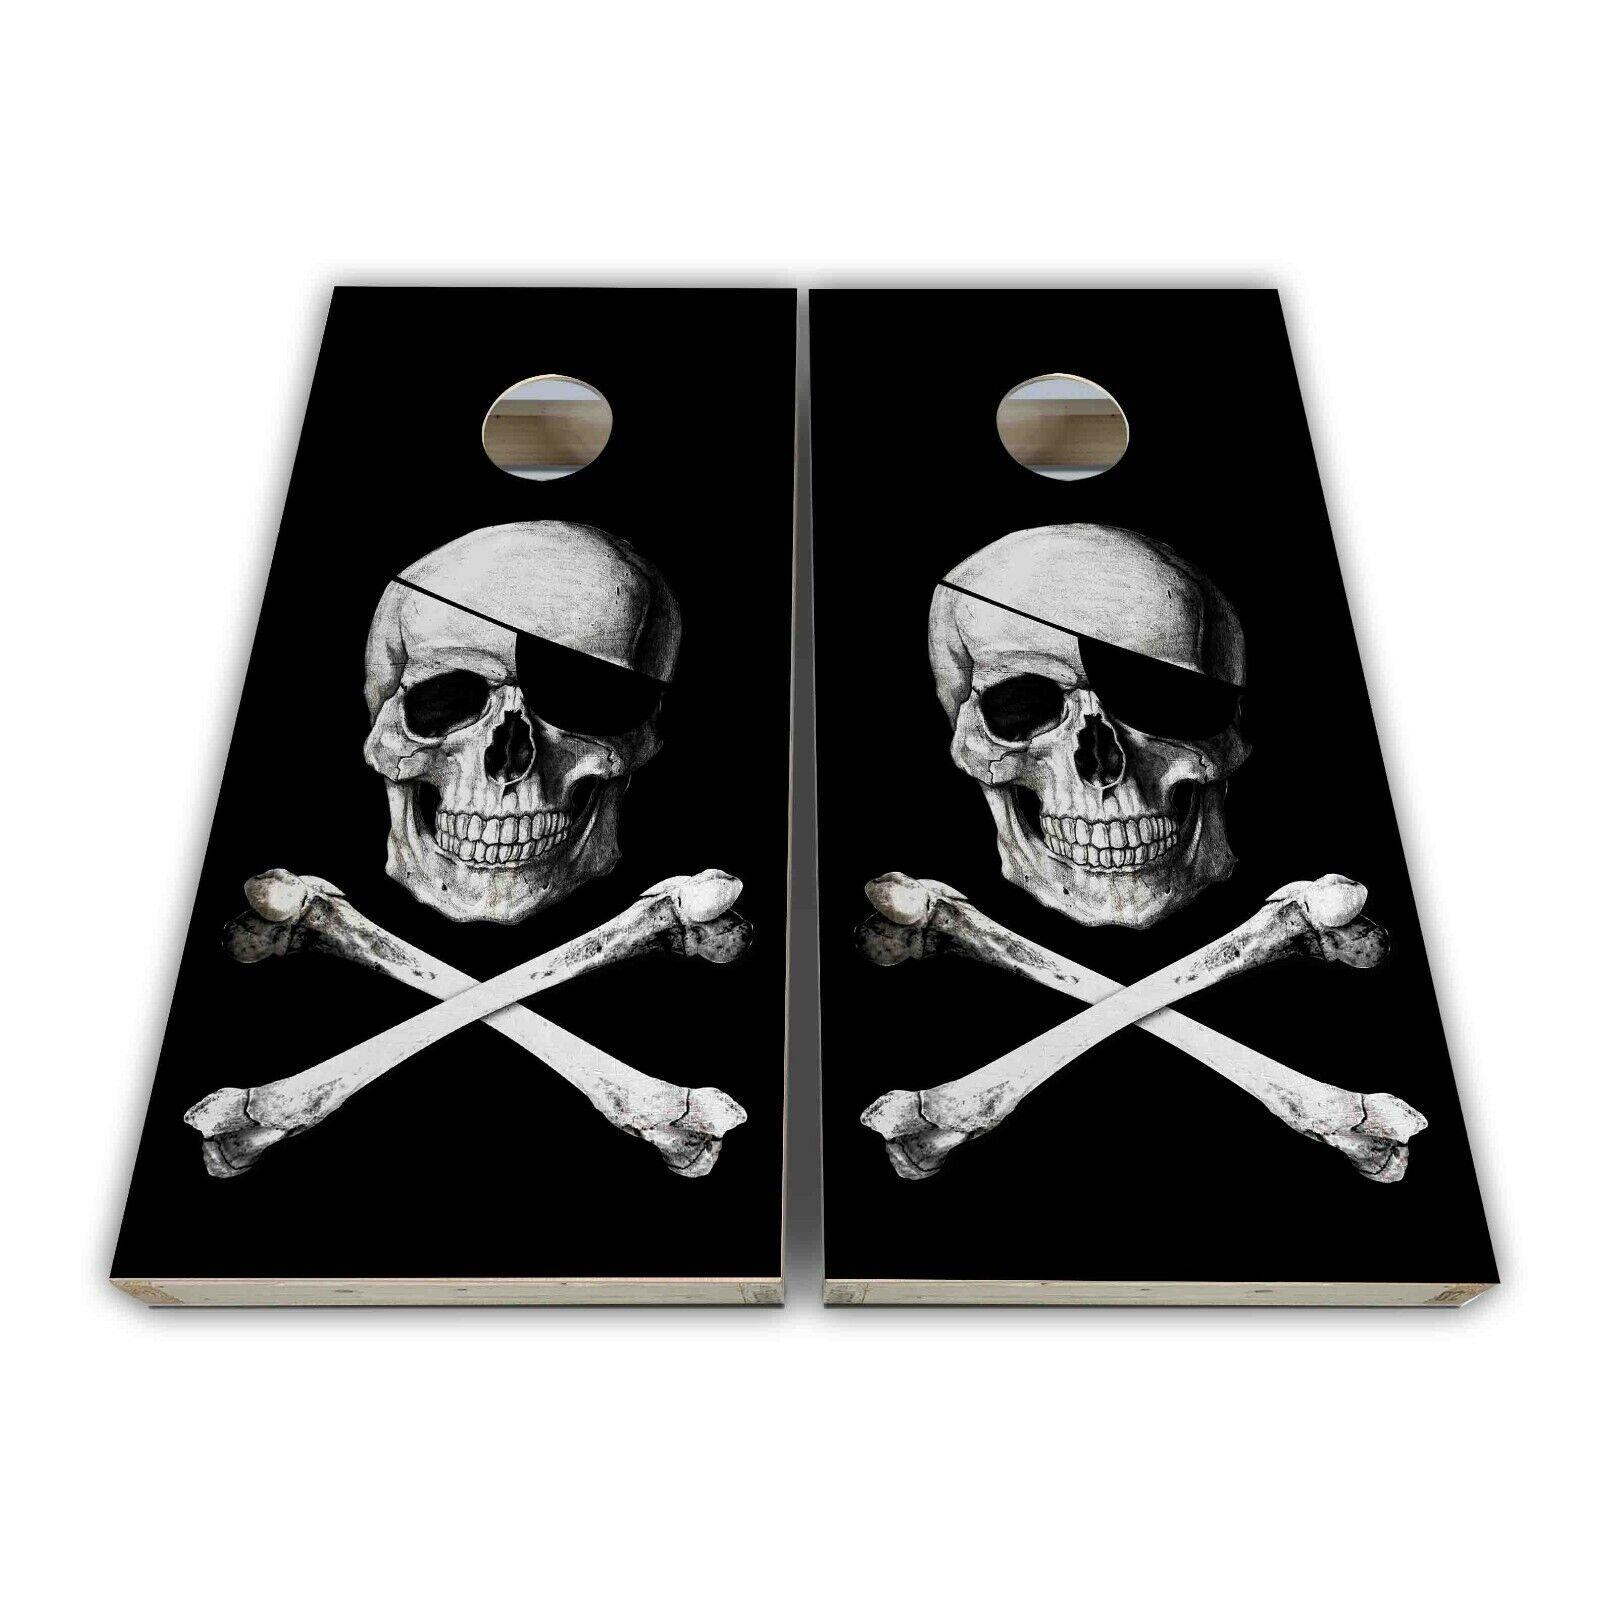 Pirate  Skull Cross Bones Cornhole Decal Laminated Vinyl 3M Cornhole Wrap SET  official authorization